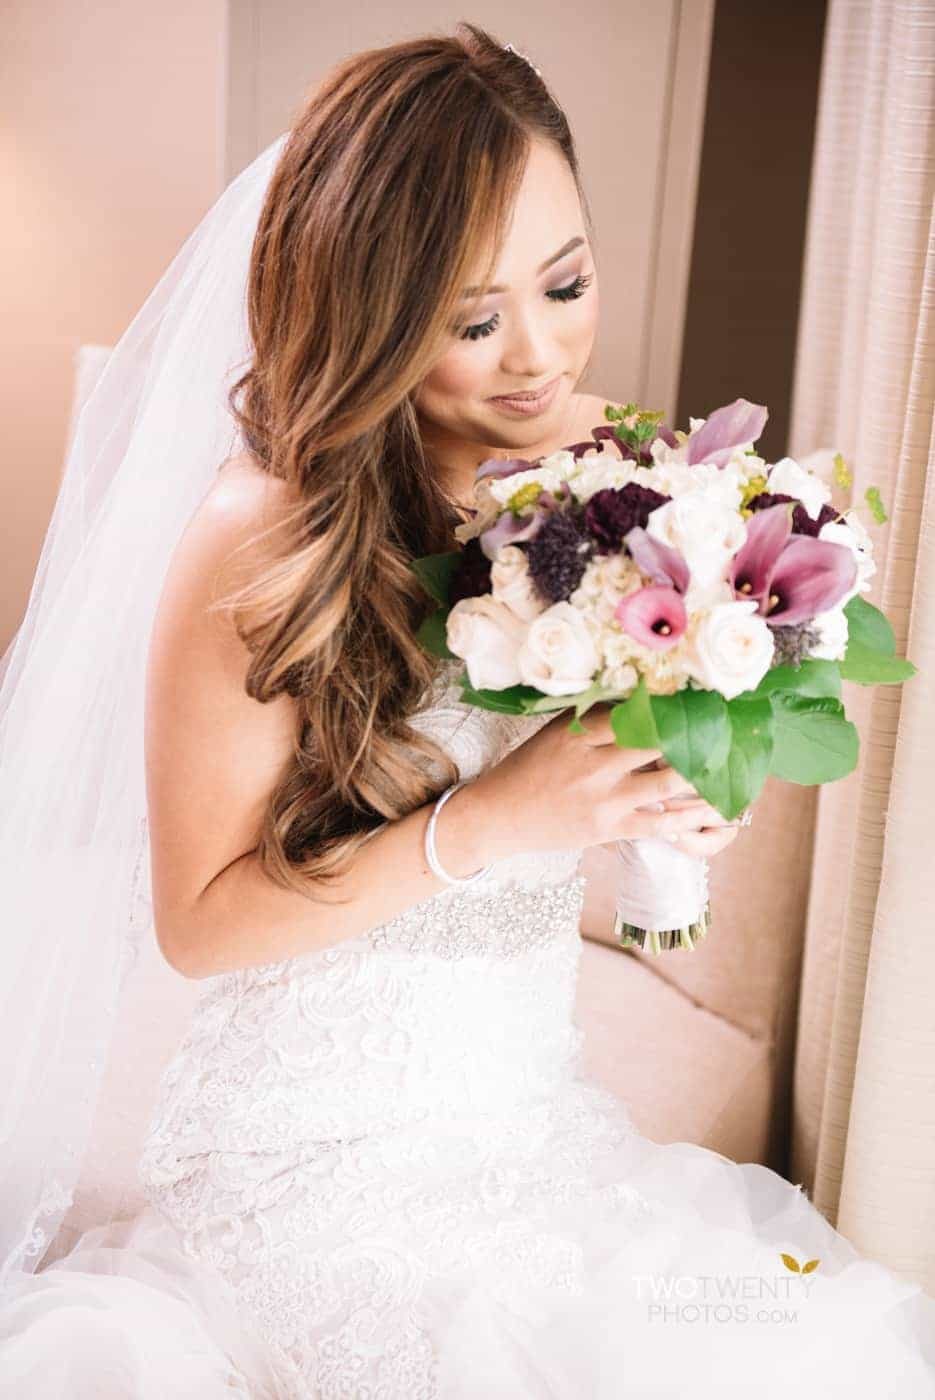 hyatt-regency-downtown-sacramento-wedding-photographer-34